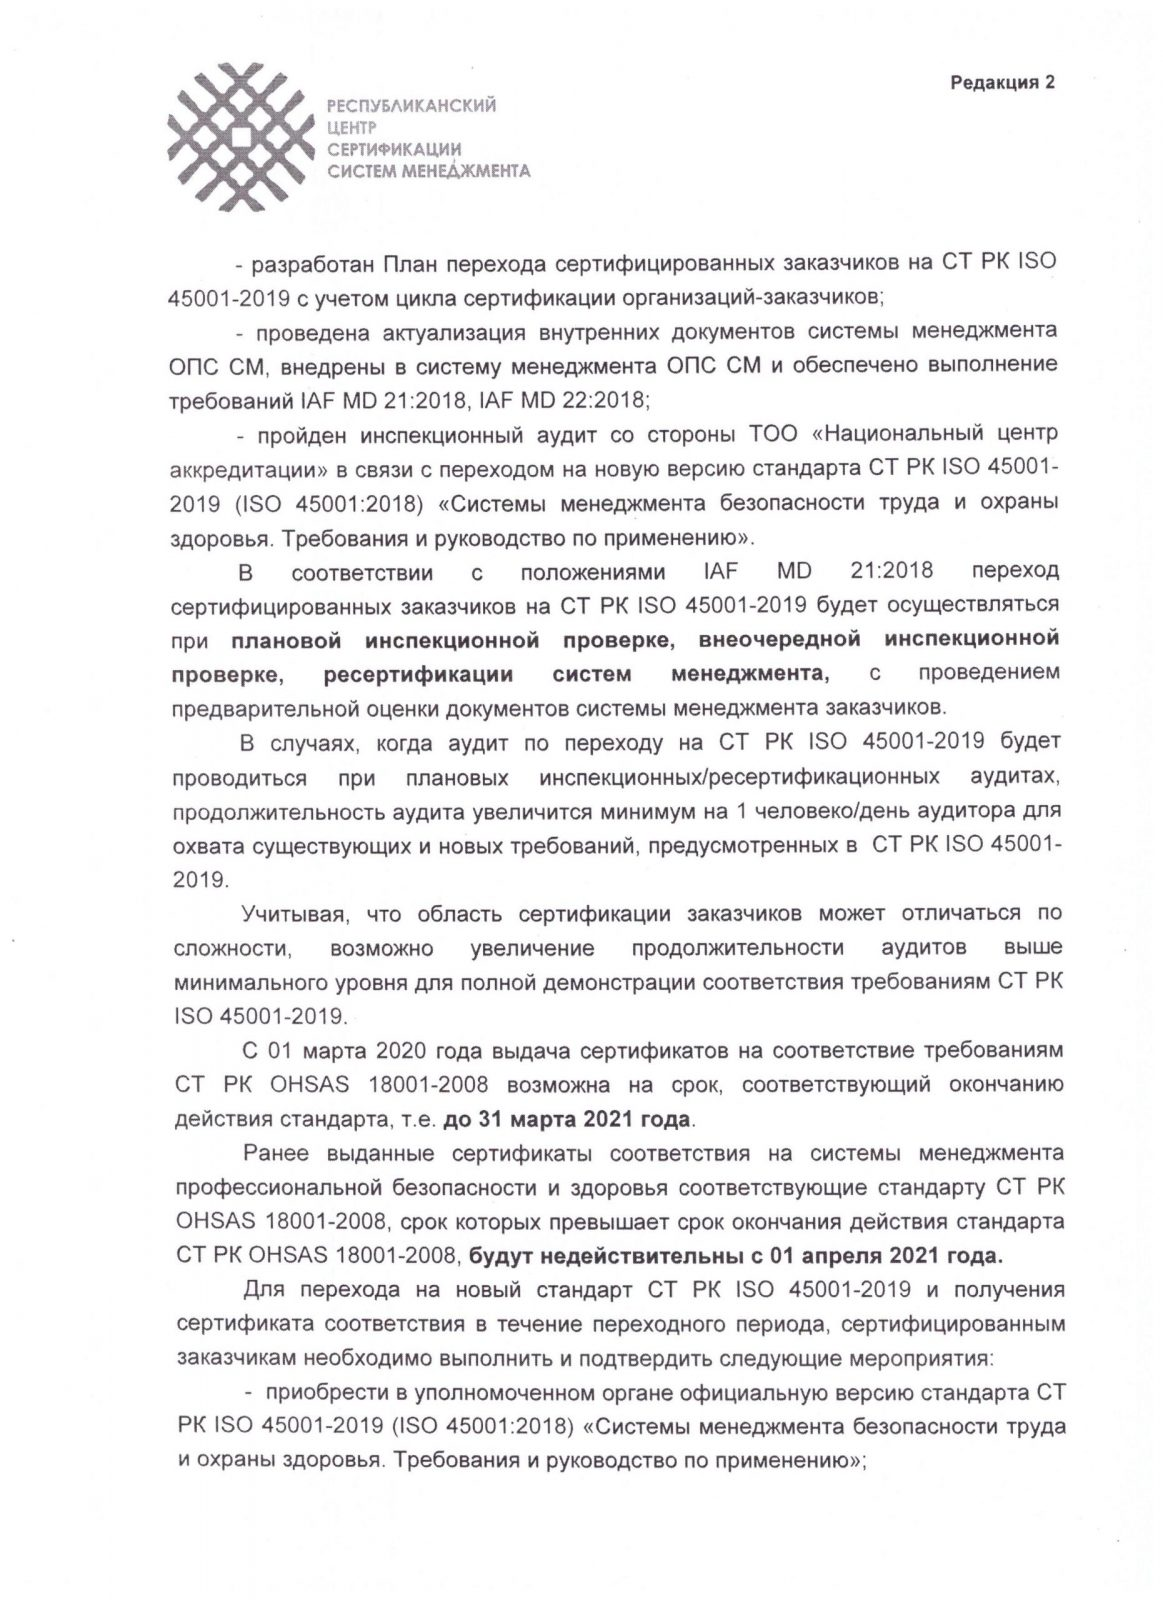 Политика по переходу на СТ РК ISO 45001-2019